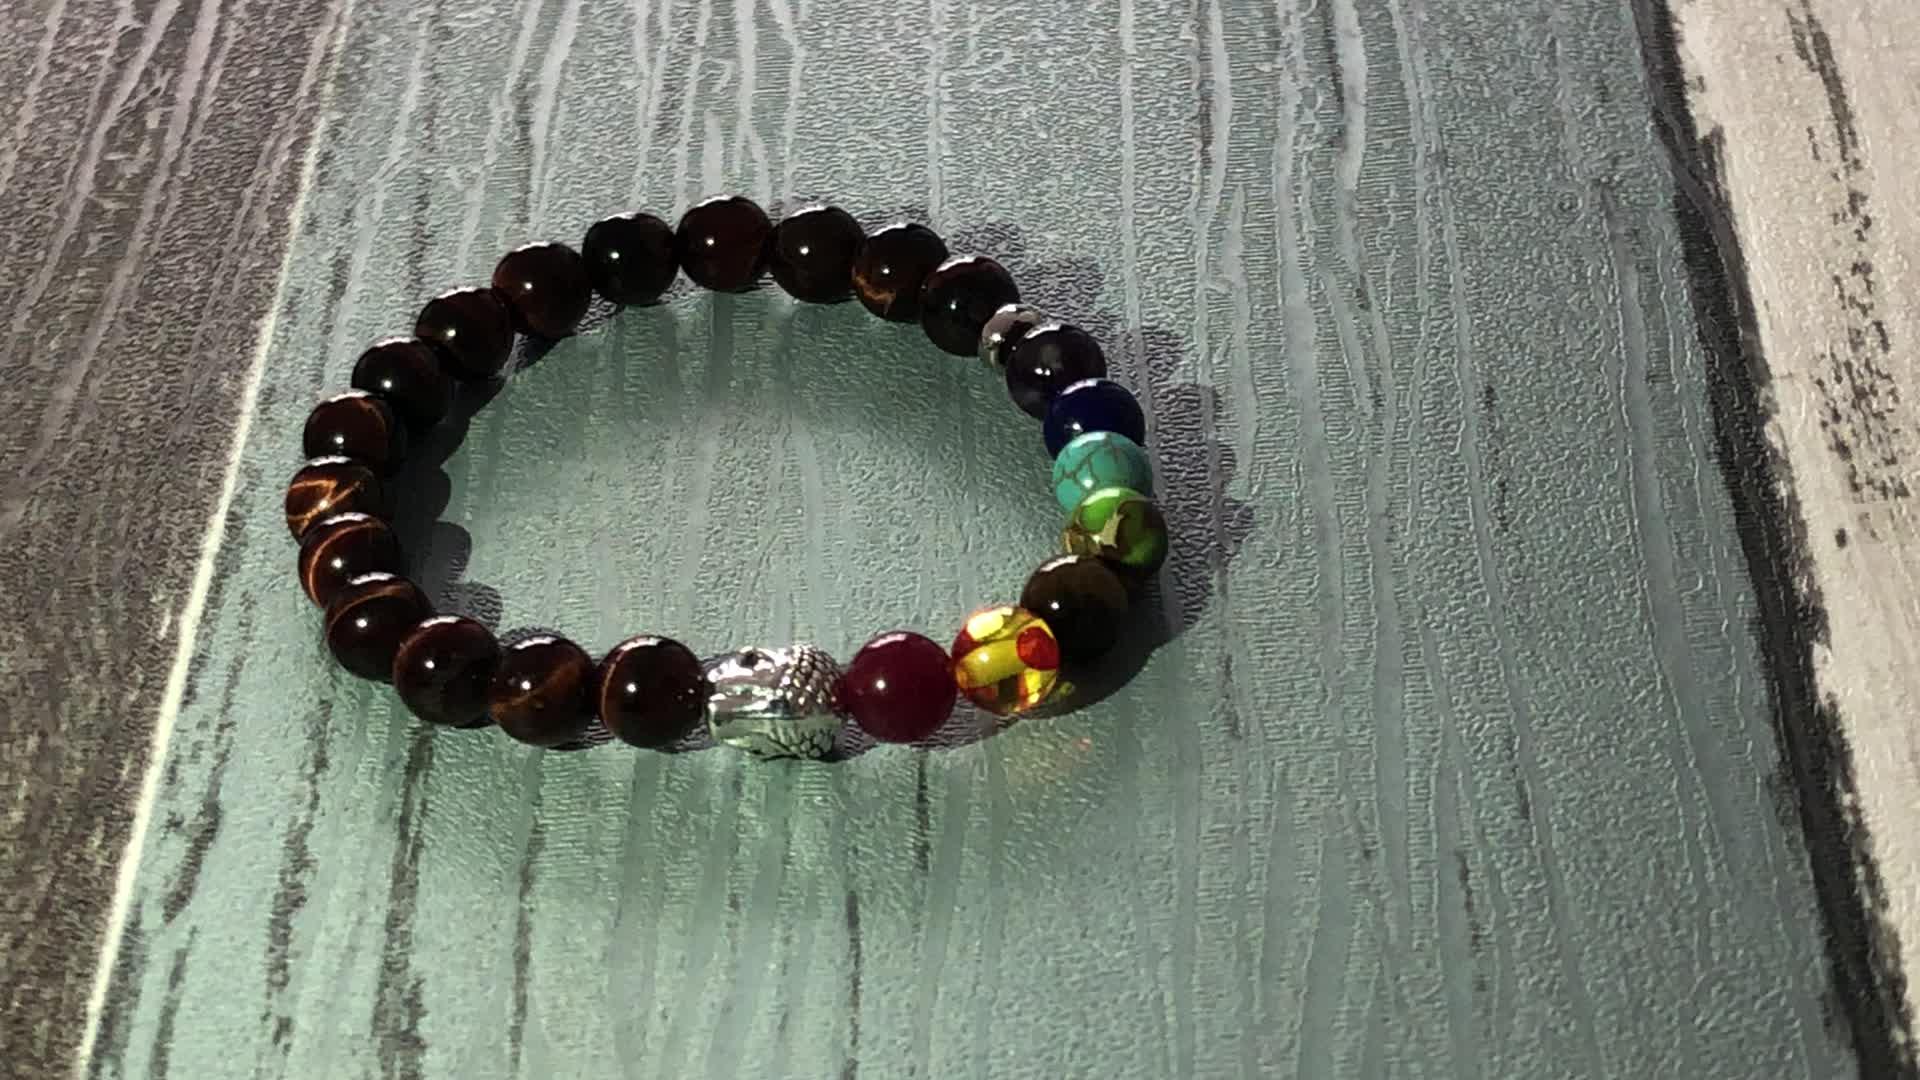 SN0923 chakra gemstones Bracelet For Unisex Red Tiger Eye Healing Buddhist Jewelry 7 Chakra Buddha Bracelet